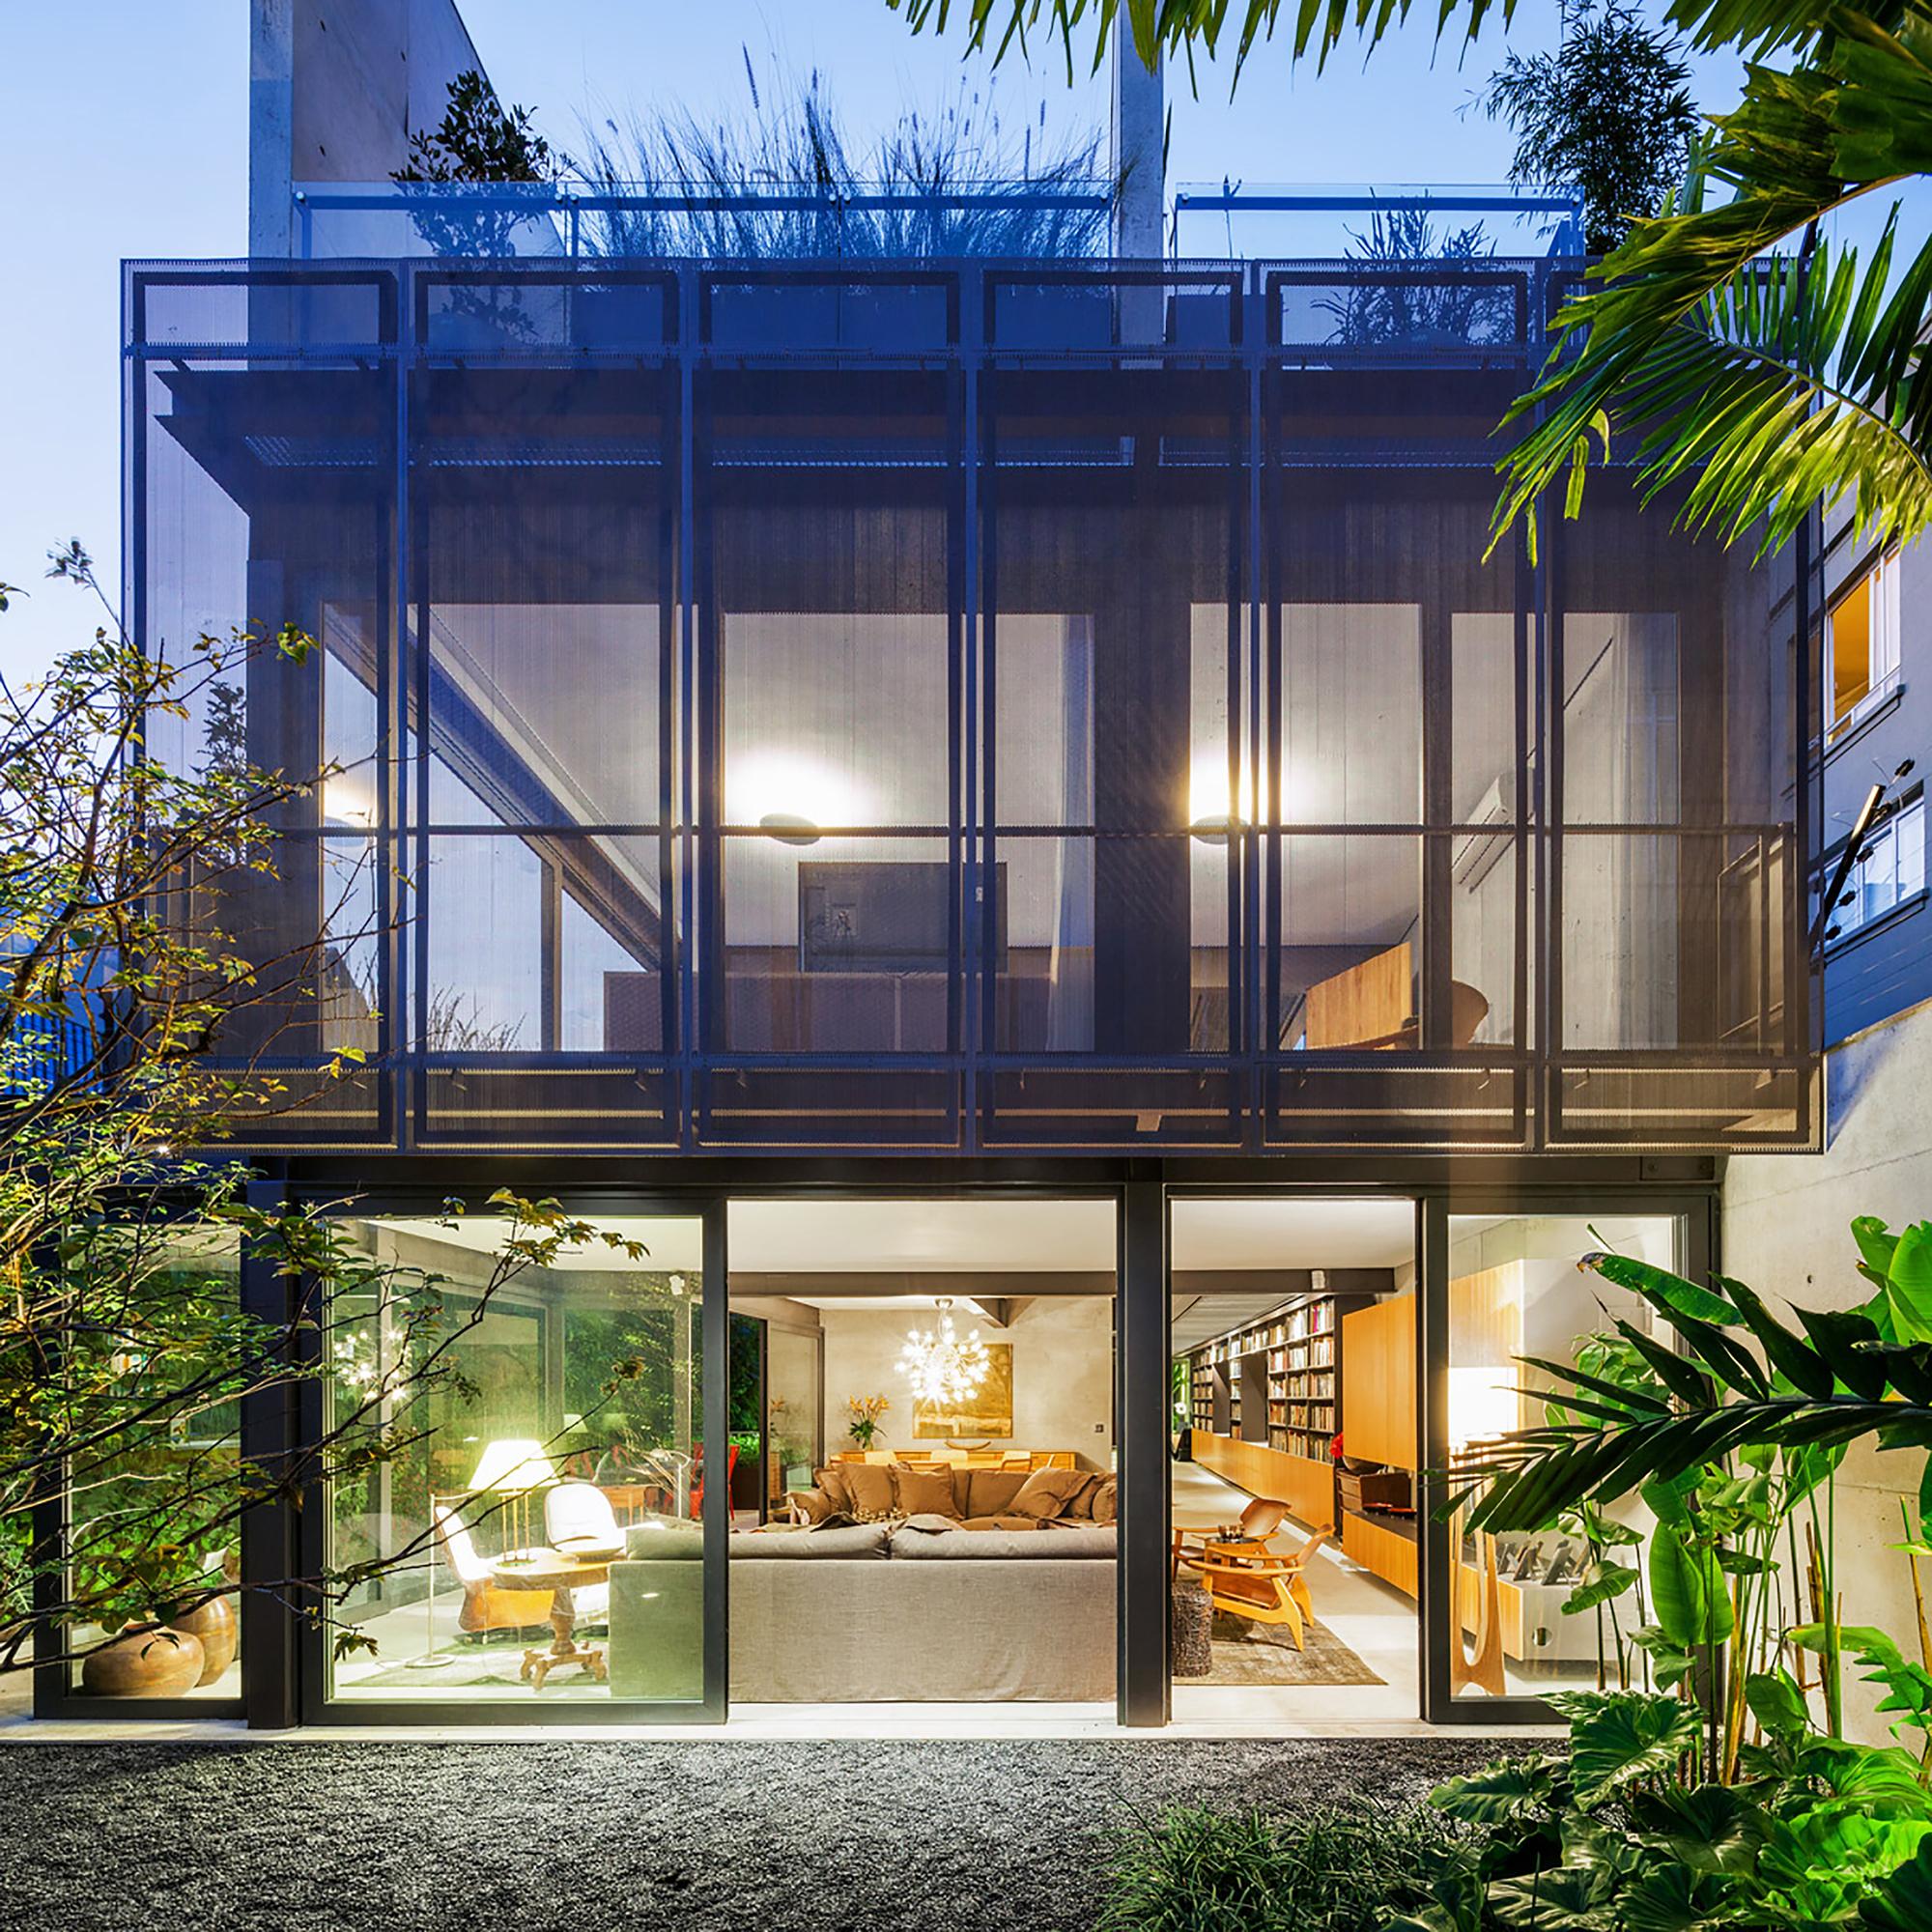 10 Brilliant Brazilian Houses With Contemporary Designs